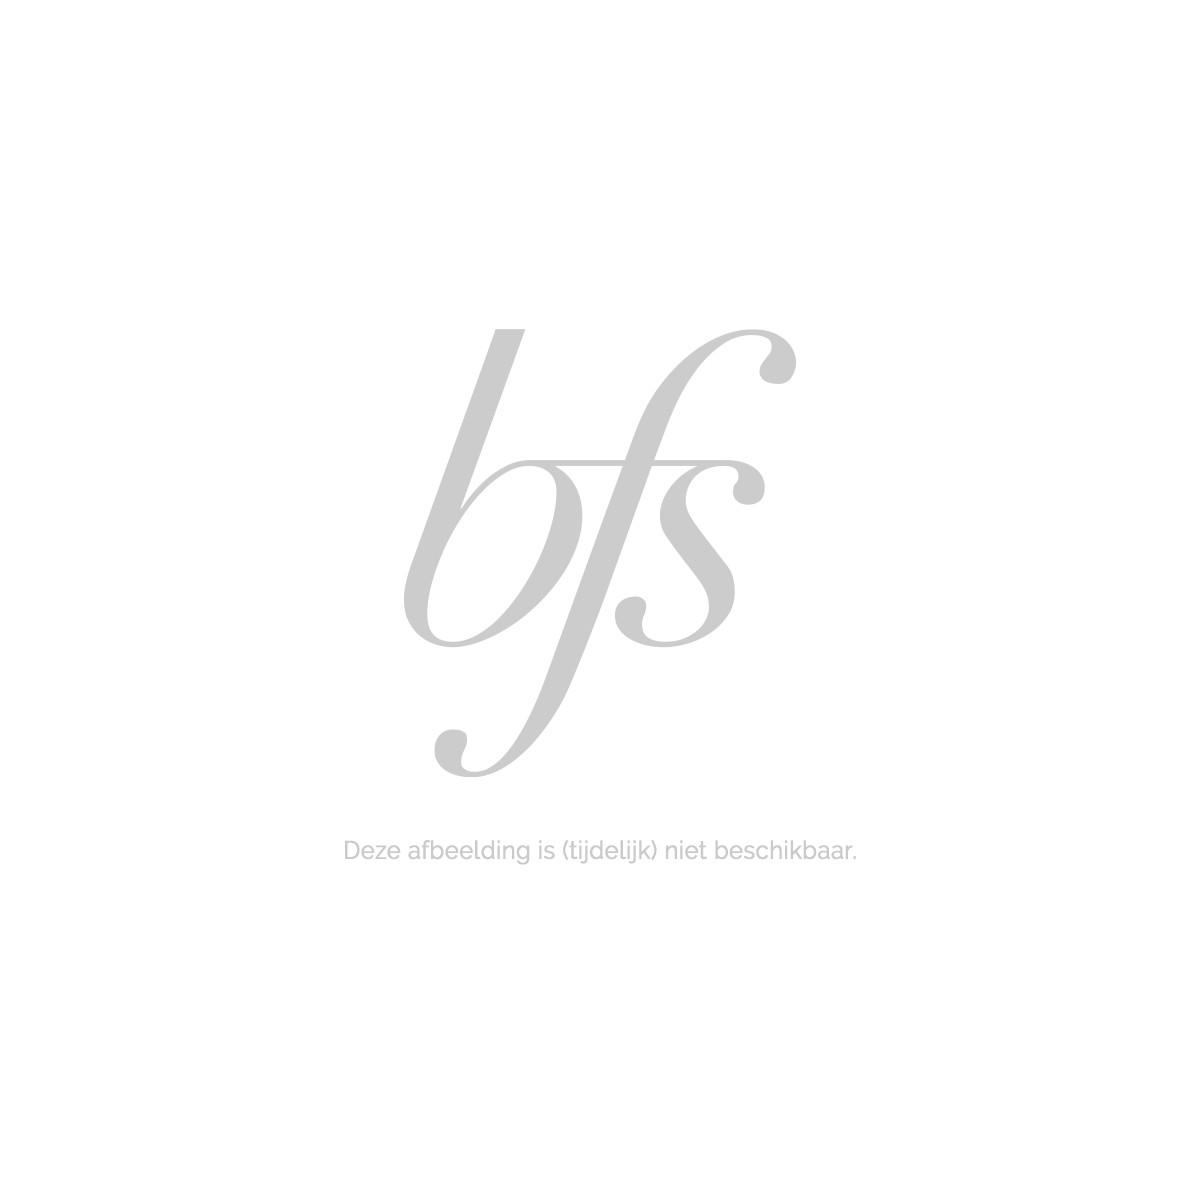 MBR Beta Enzyme Tissue Activator Skin Sealer Protection Shield